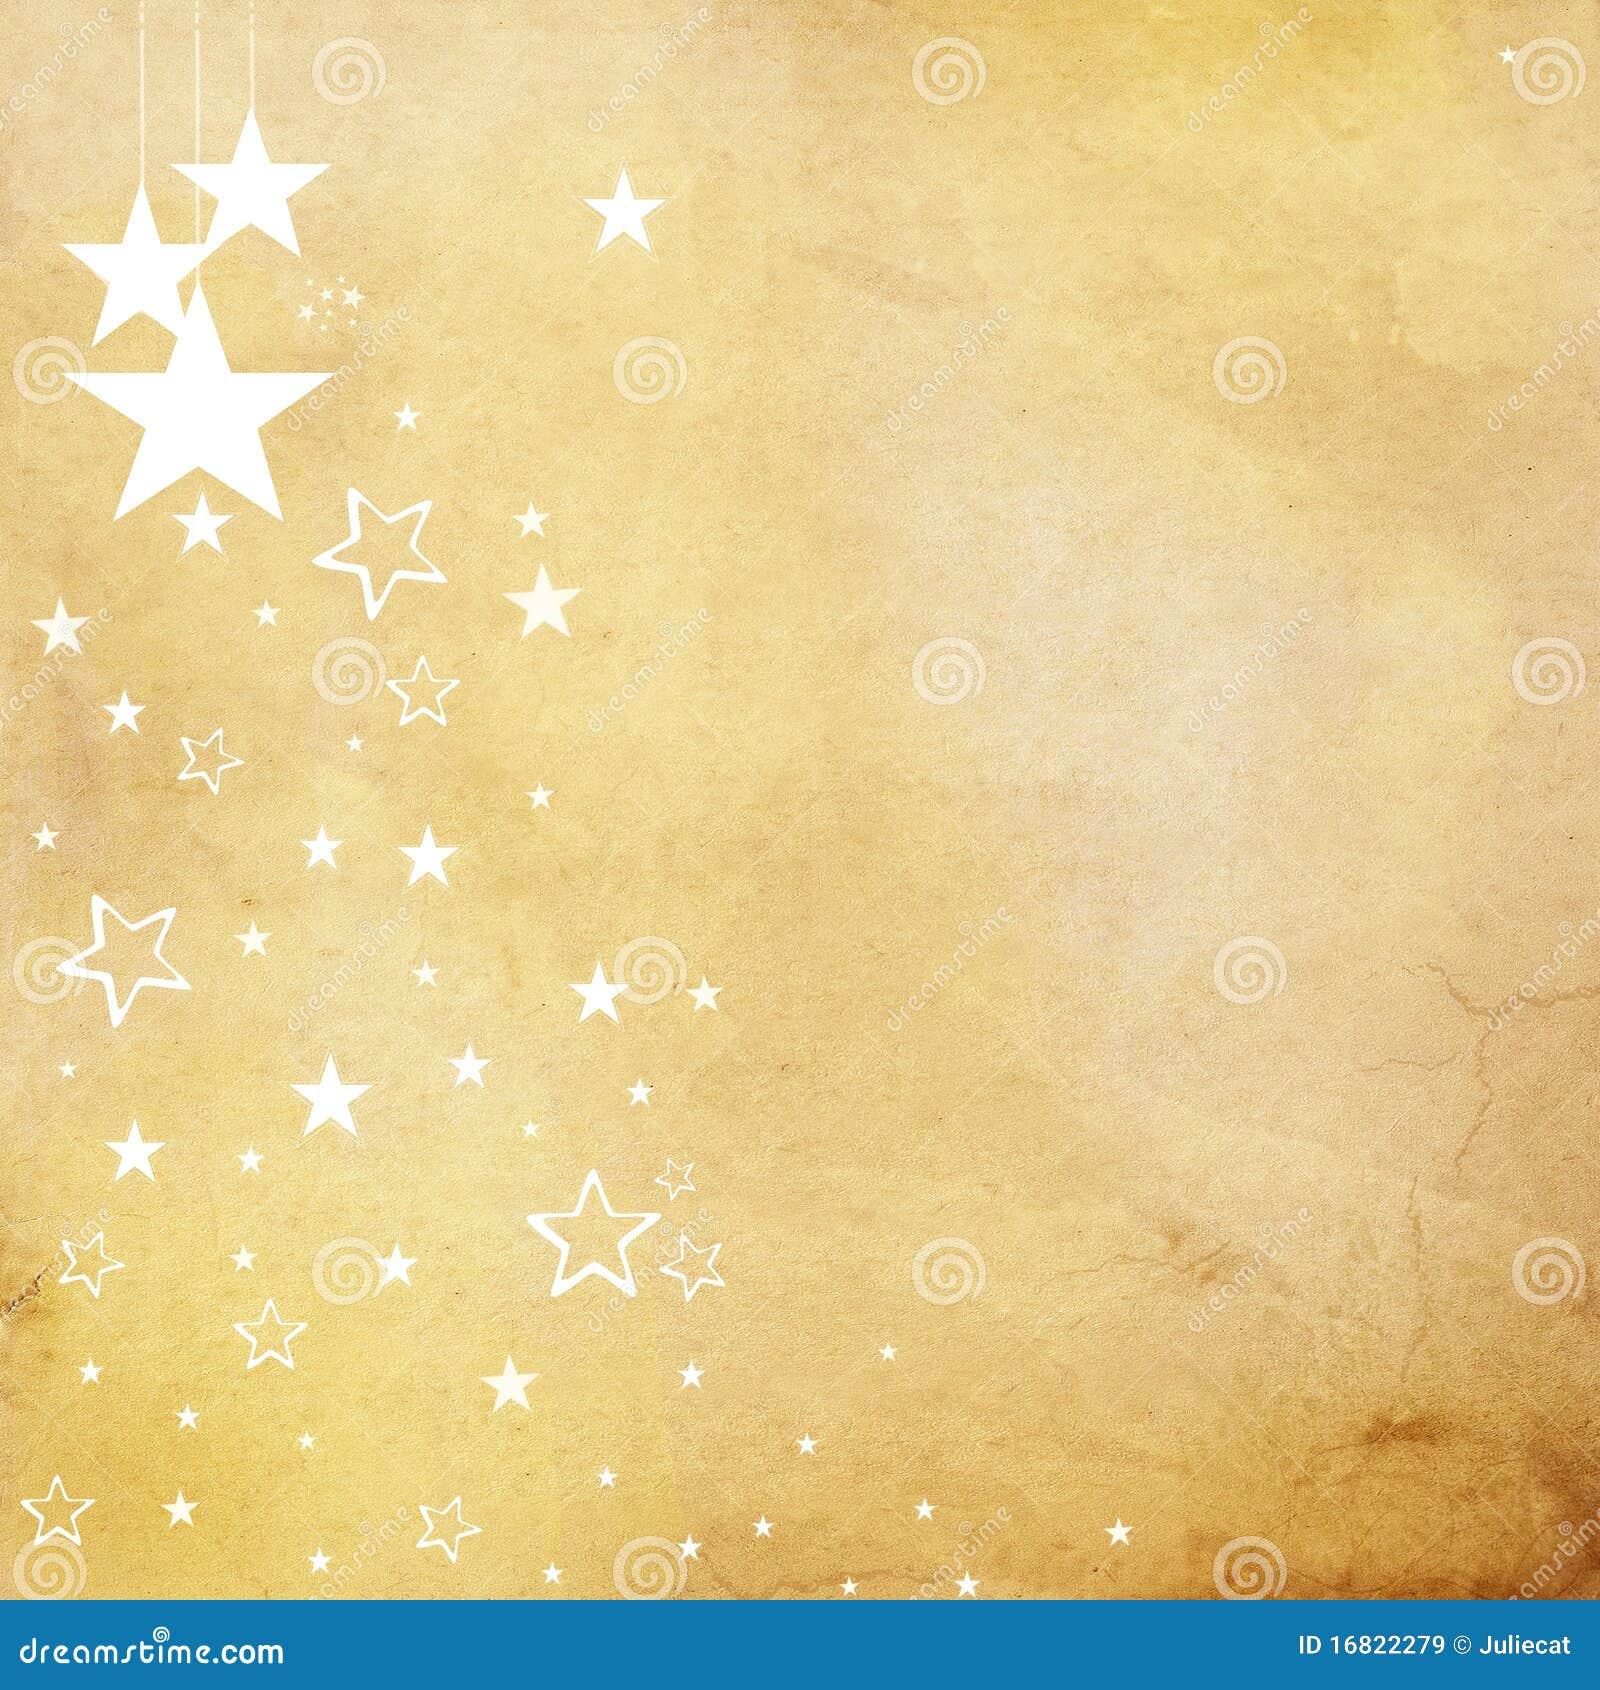 White Stars On Beige Paper Background Stock Illustration